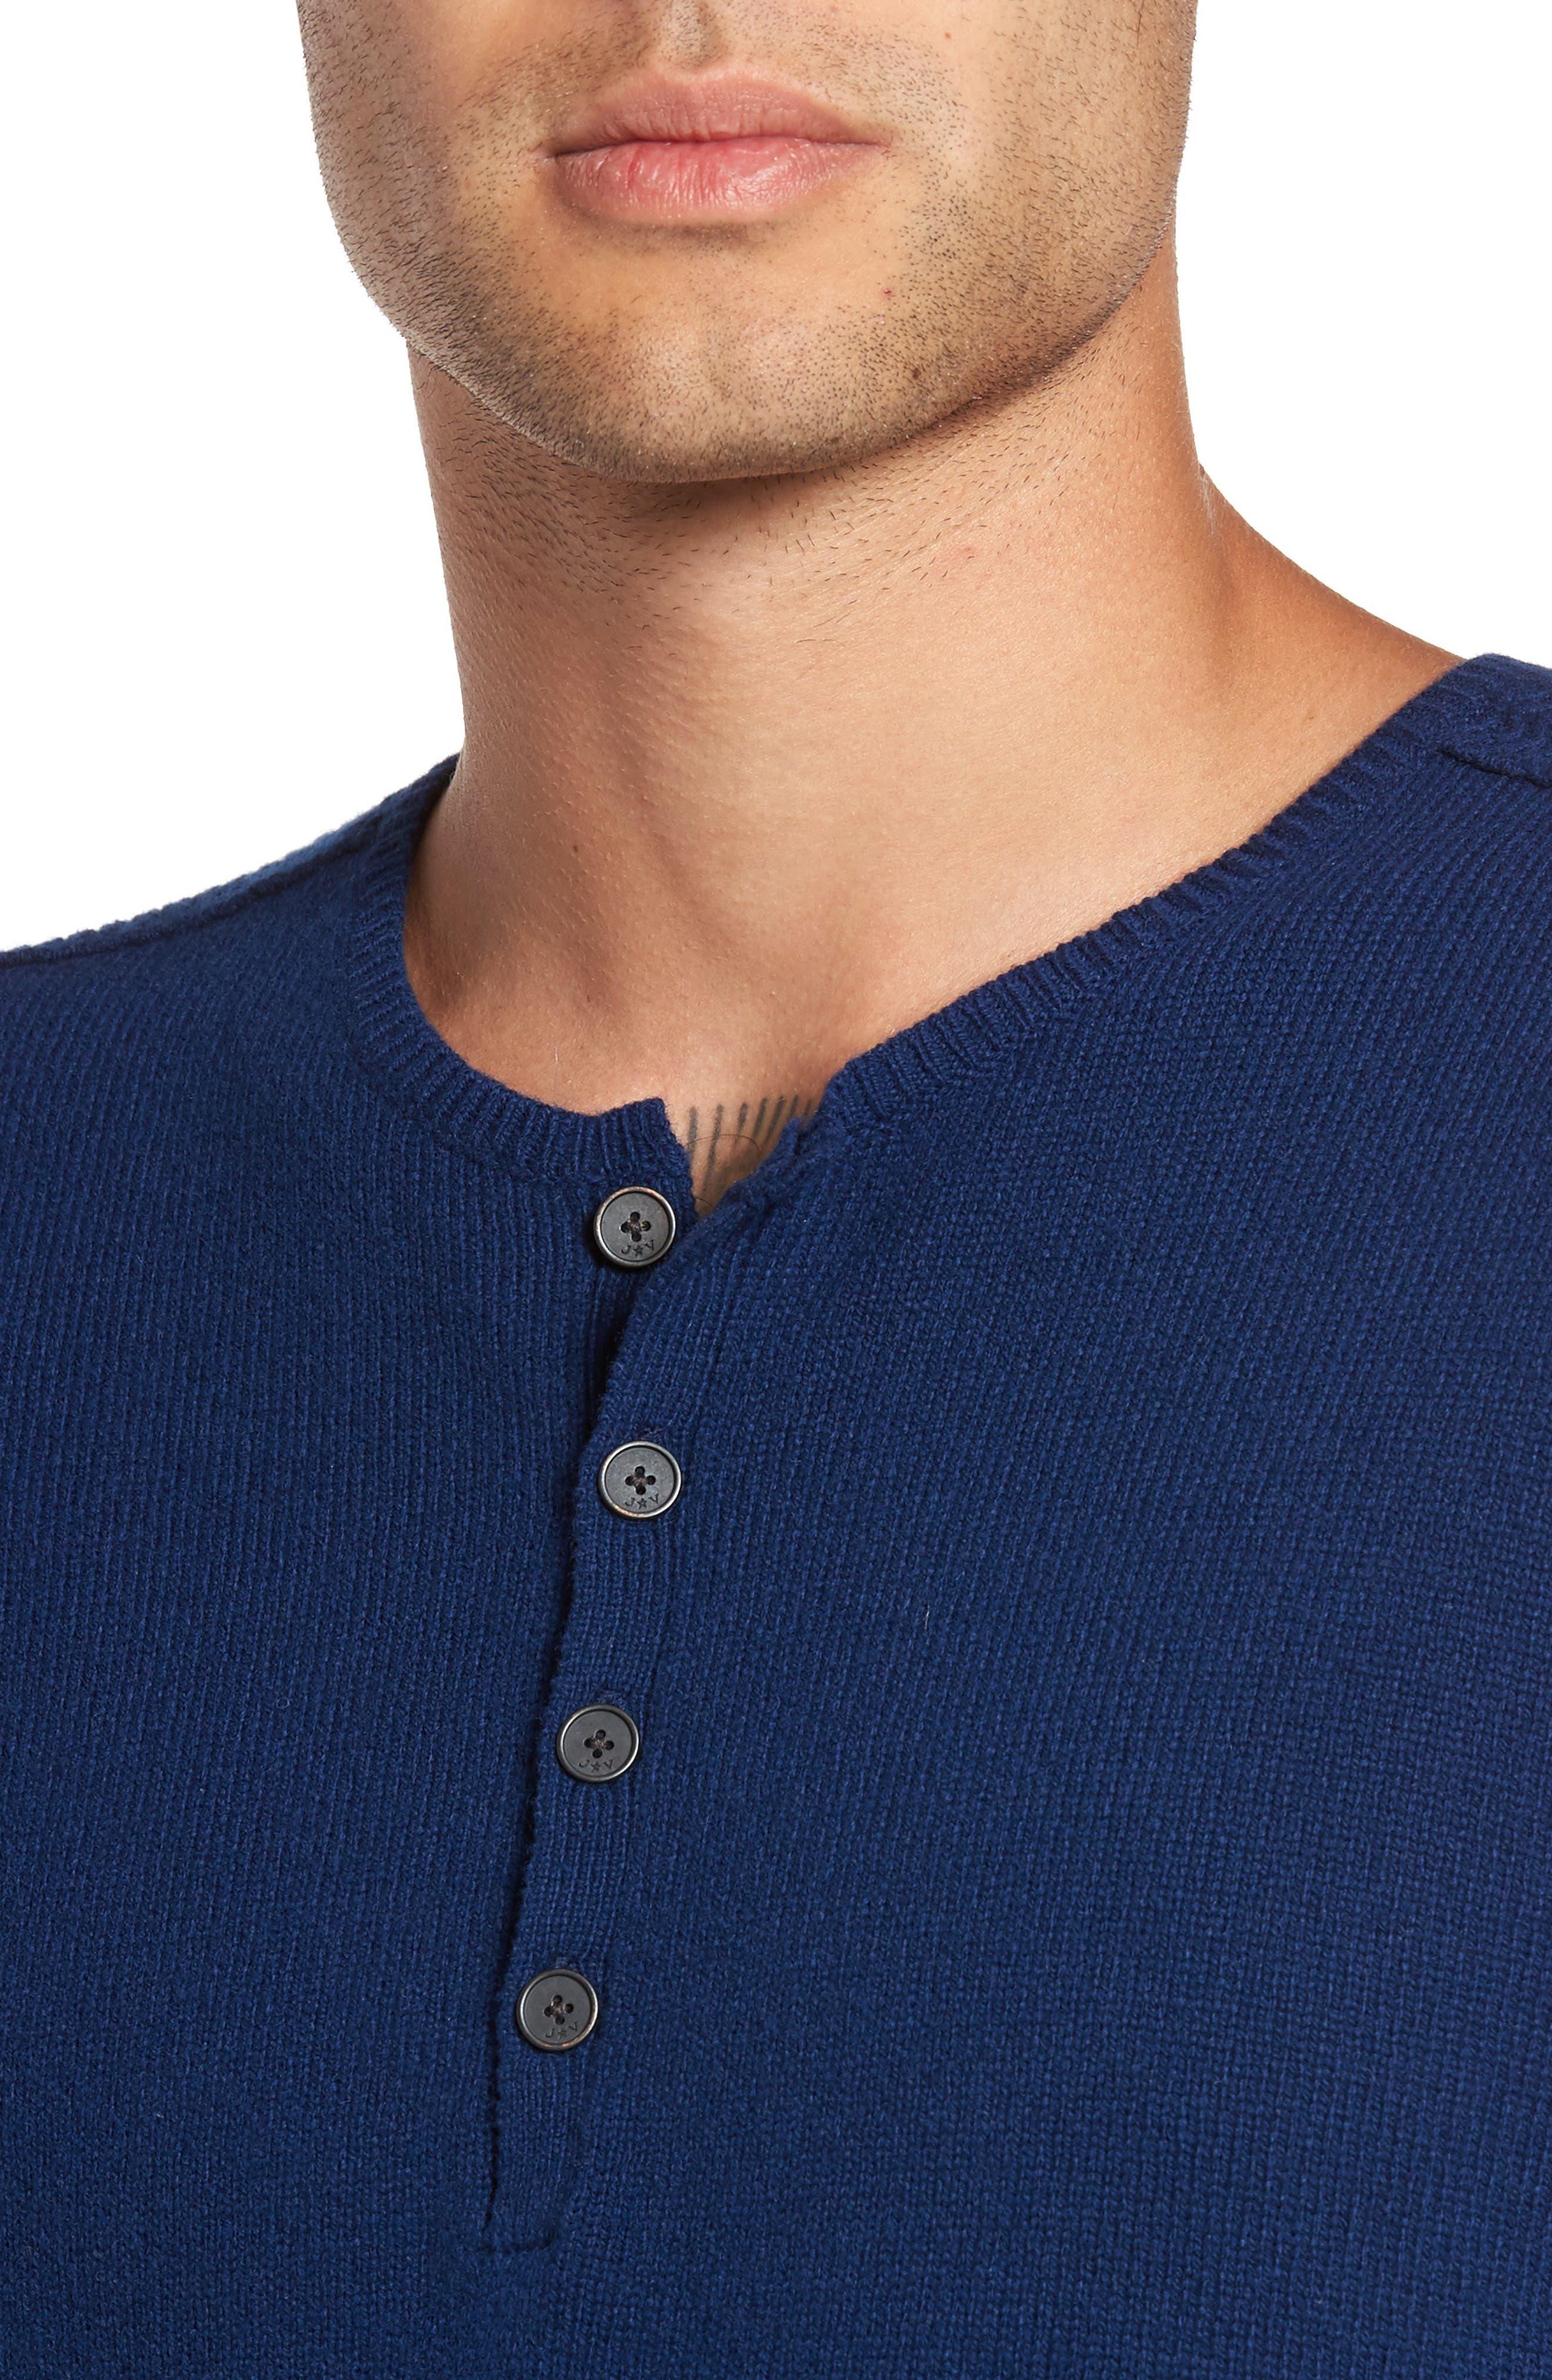 Henley Sweater,                             Alternate thumbnail 3, color,                             Atlantic Blue